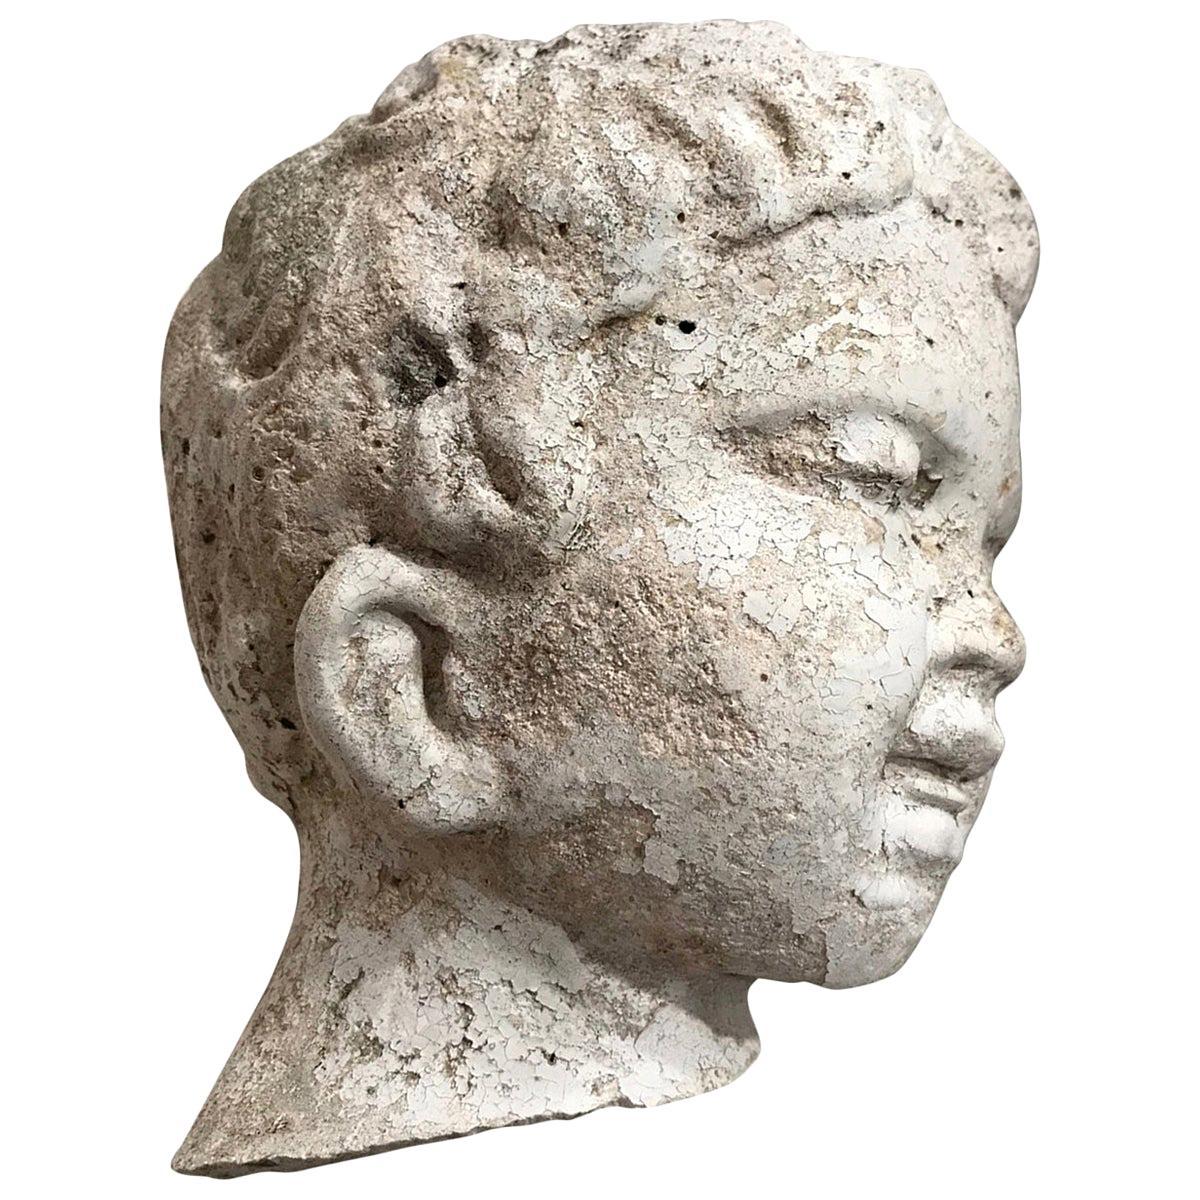 Vintage Garden Statue Fragment of Boy in Cast Stone, France, circa 1990